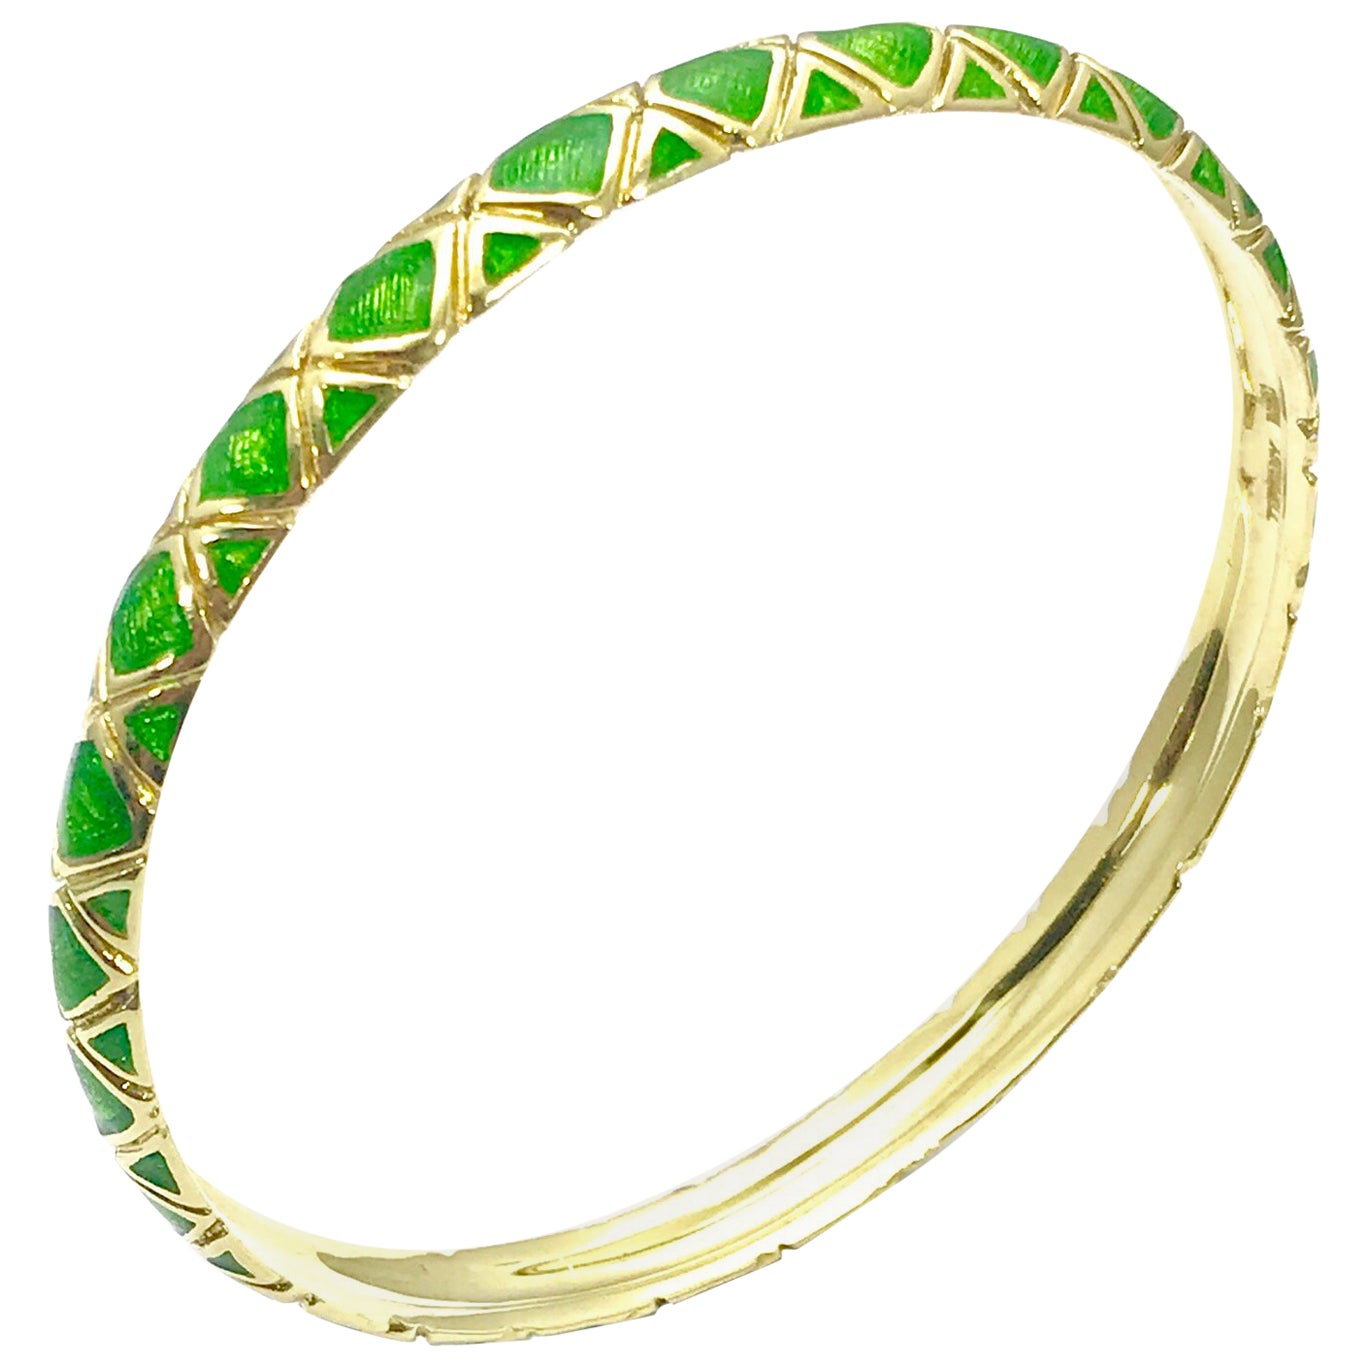 Tiffany & Co. 18 Karat Gold and Green Enamel Bangle Bracelet